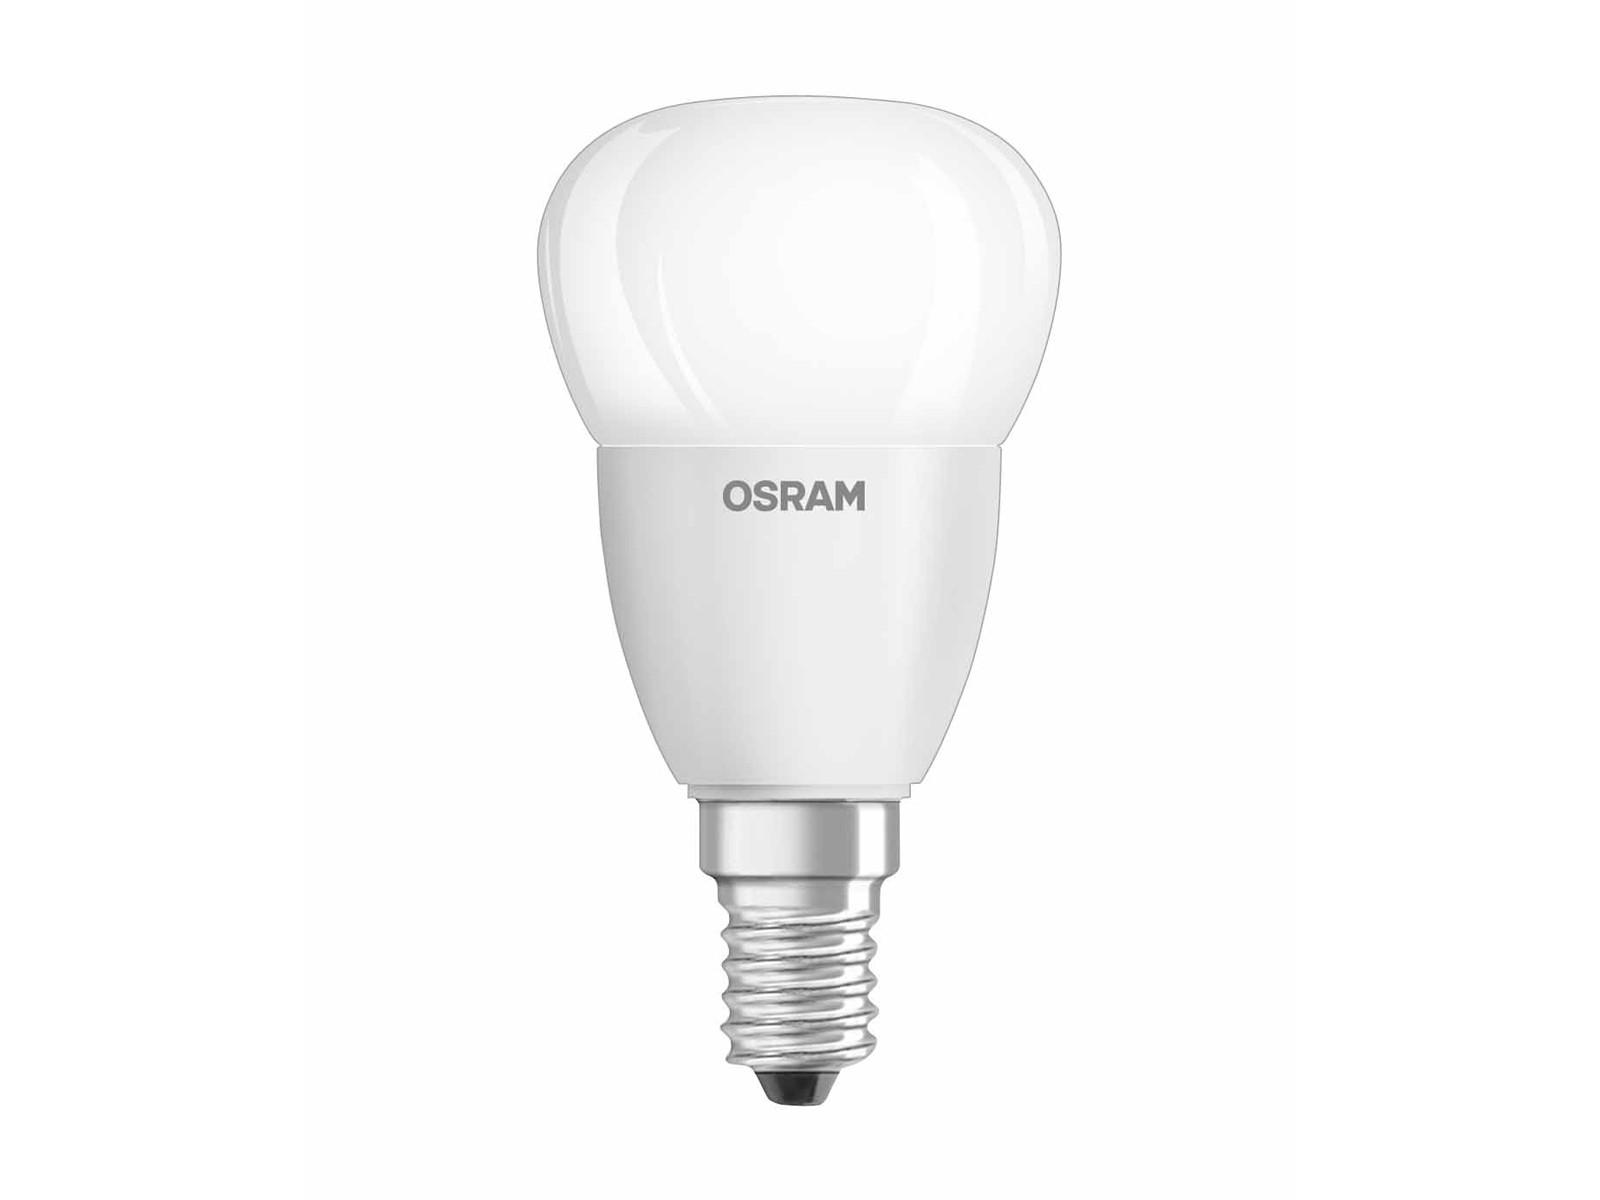 osram led star p40 birne e14 6w 470 lumen warmweiss 2700 k. Black Bedroom Furniture Sets. Home Design Ideas